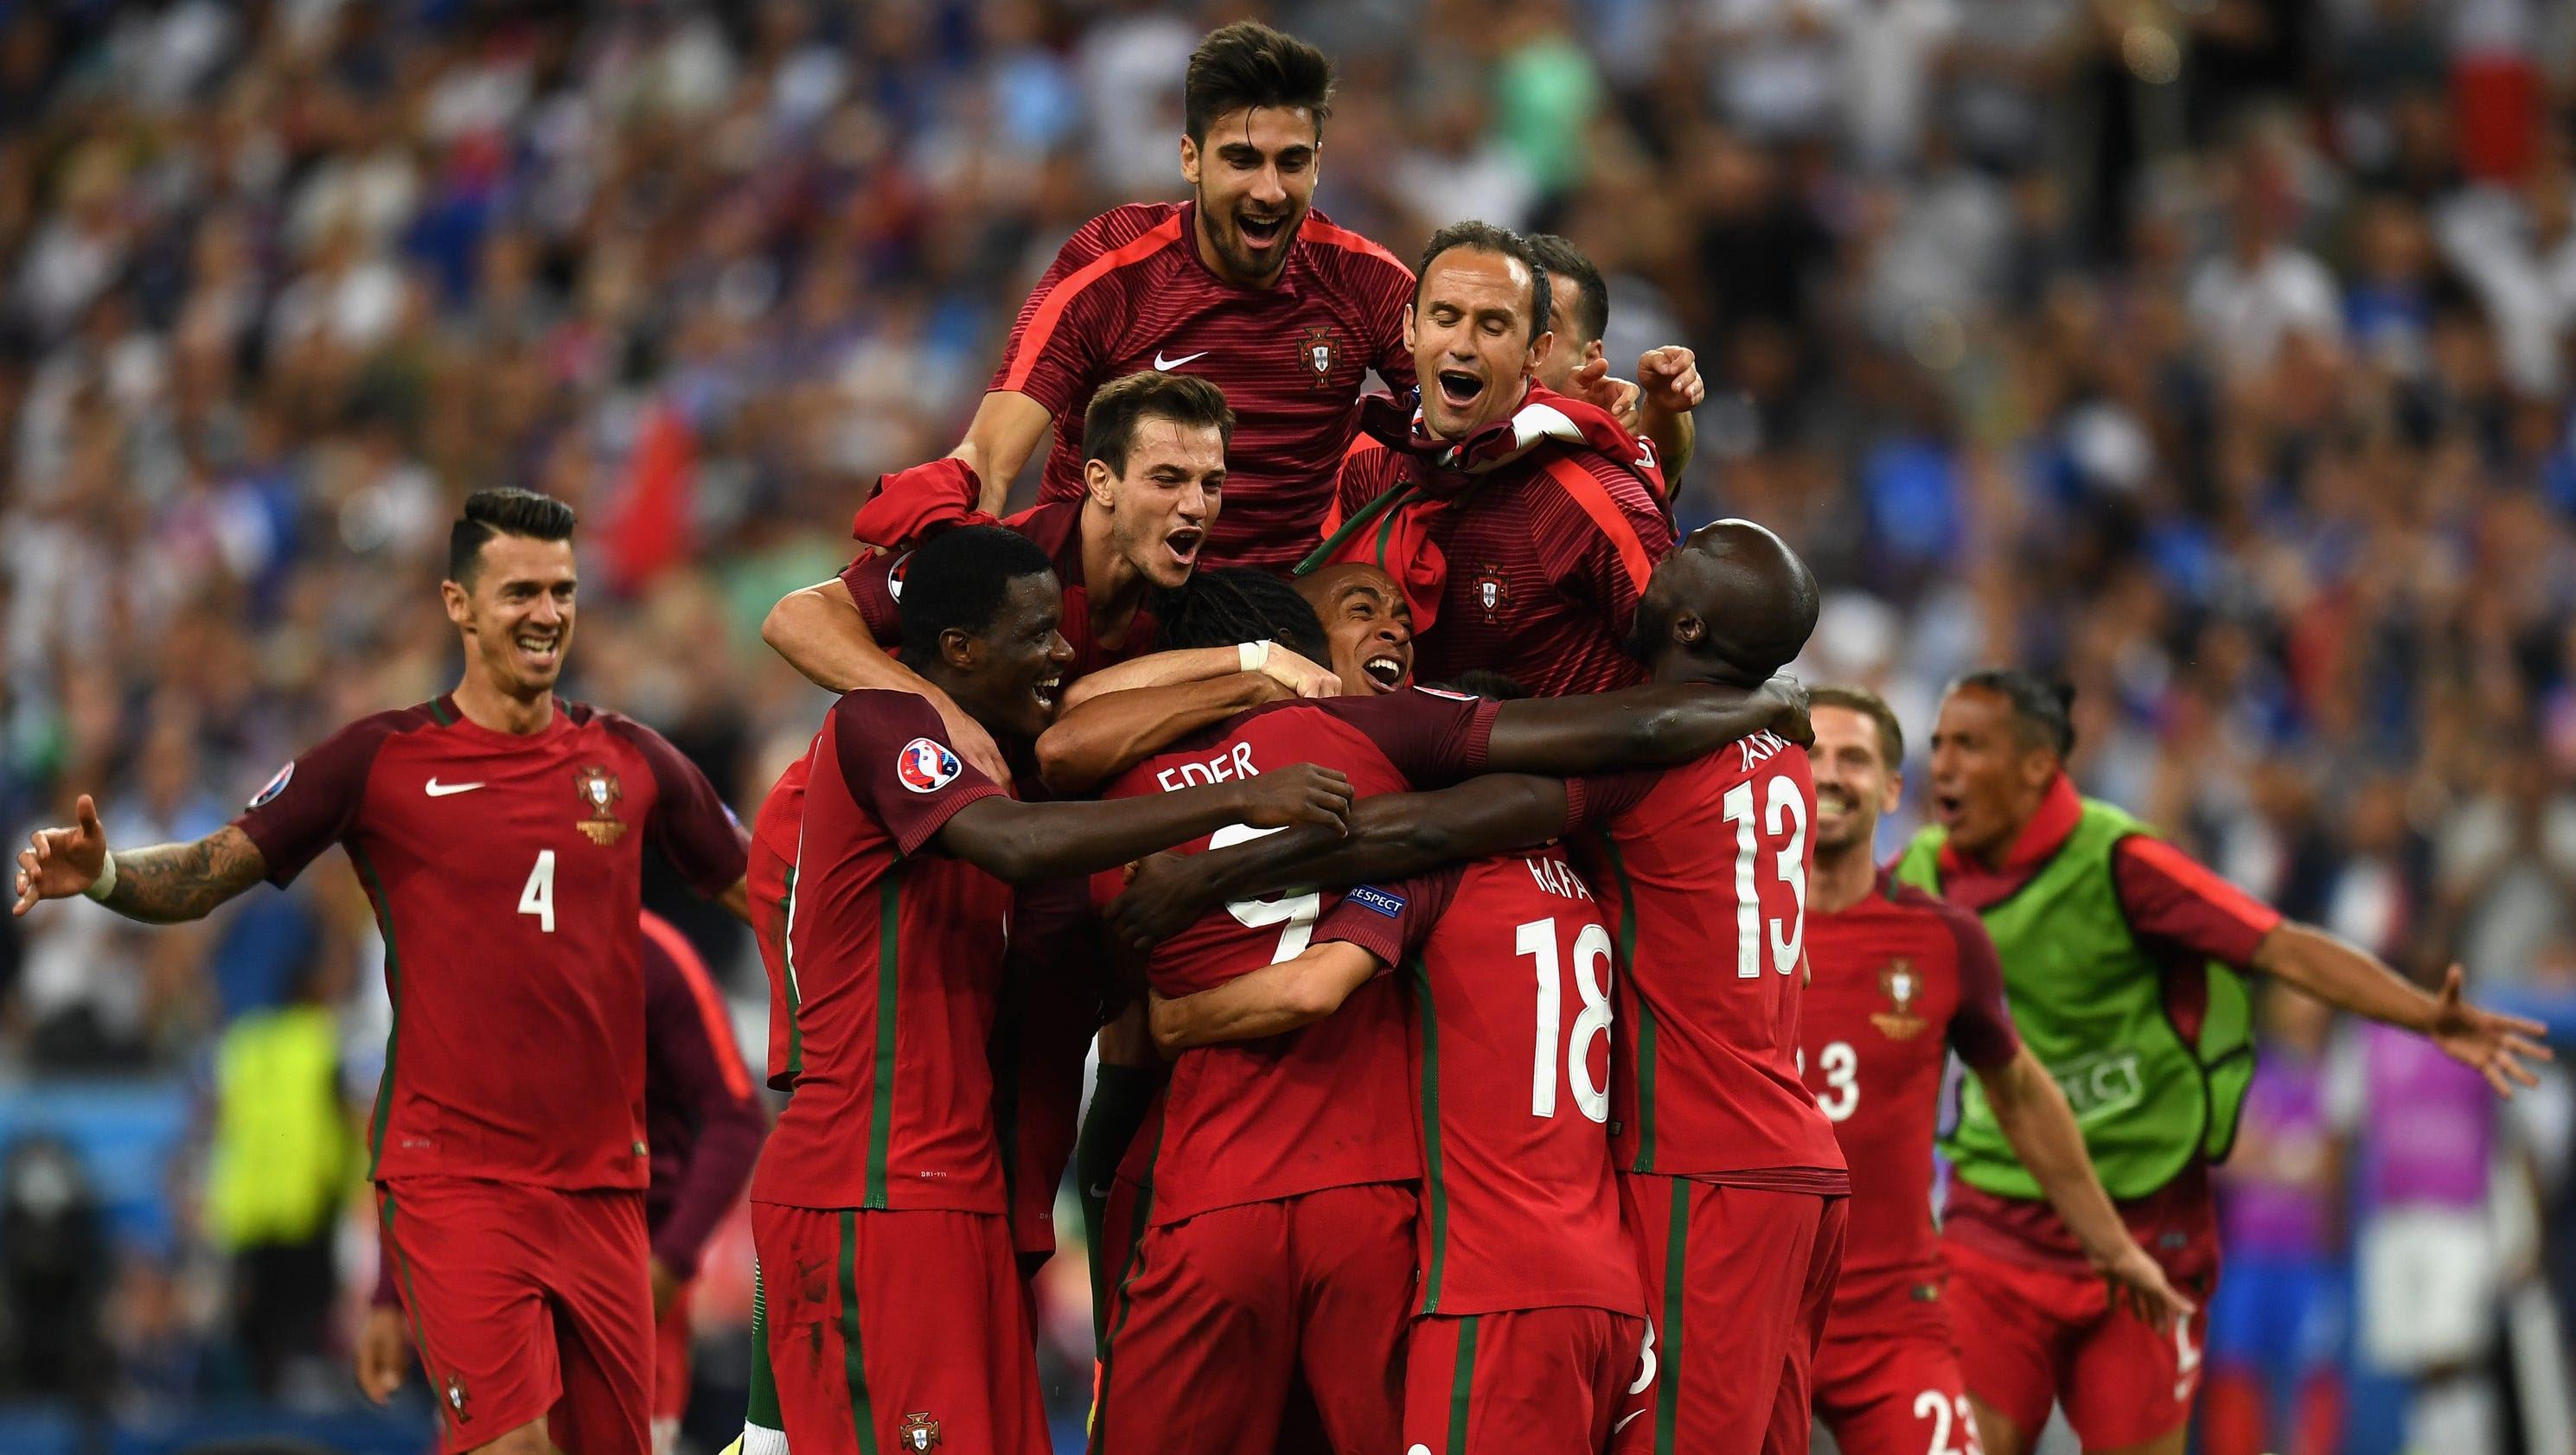 Euro 2016 final: Portugal vs. France